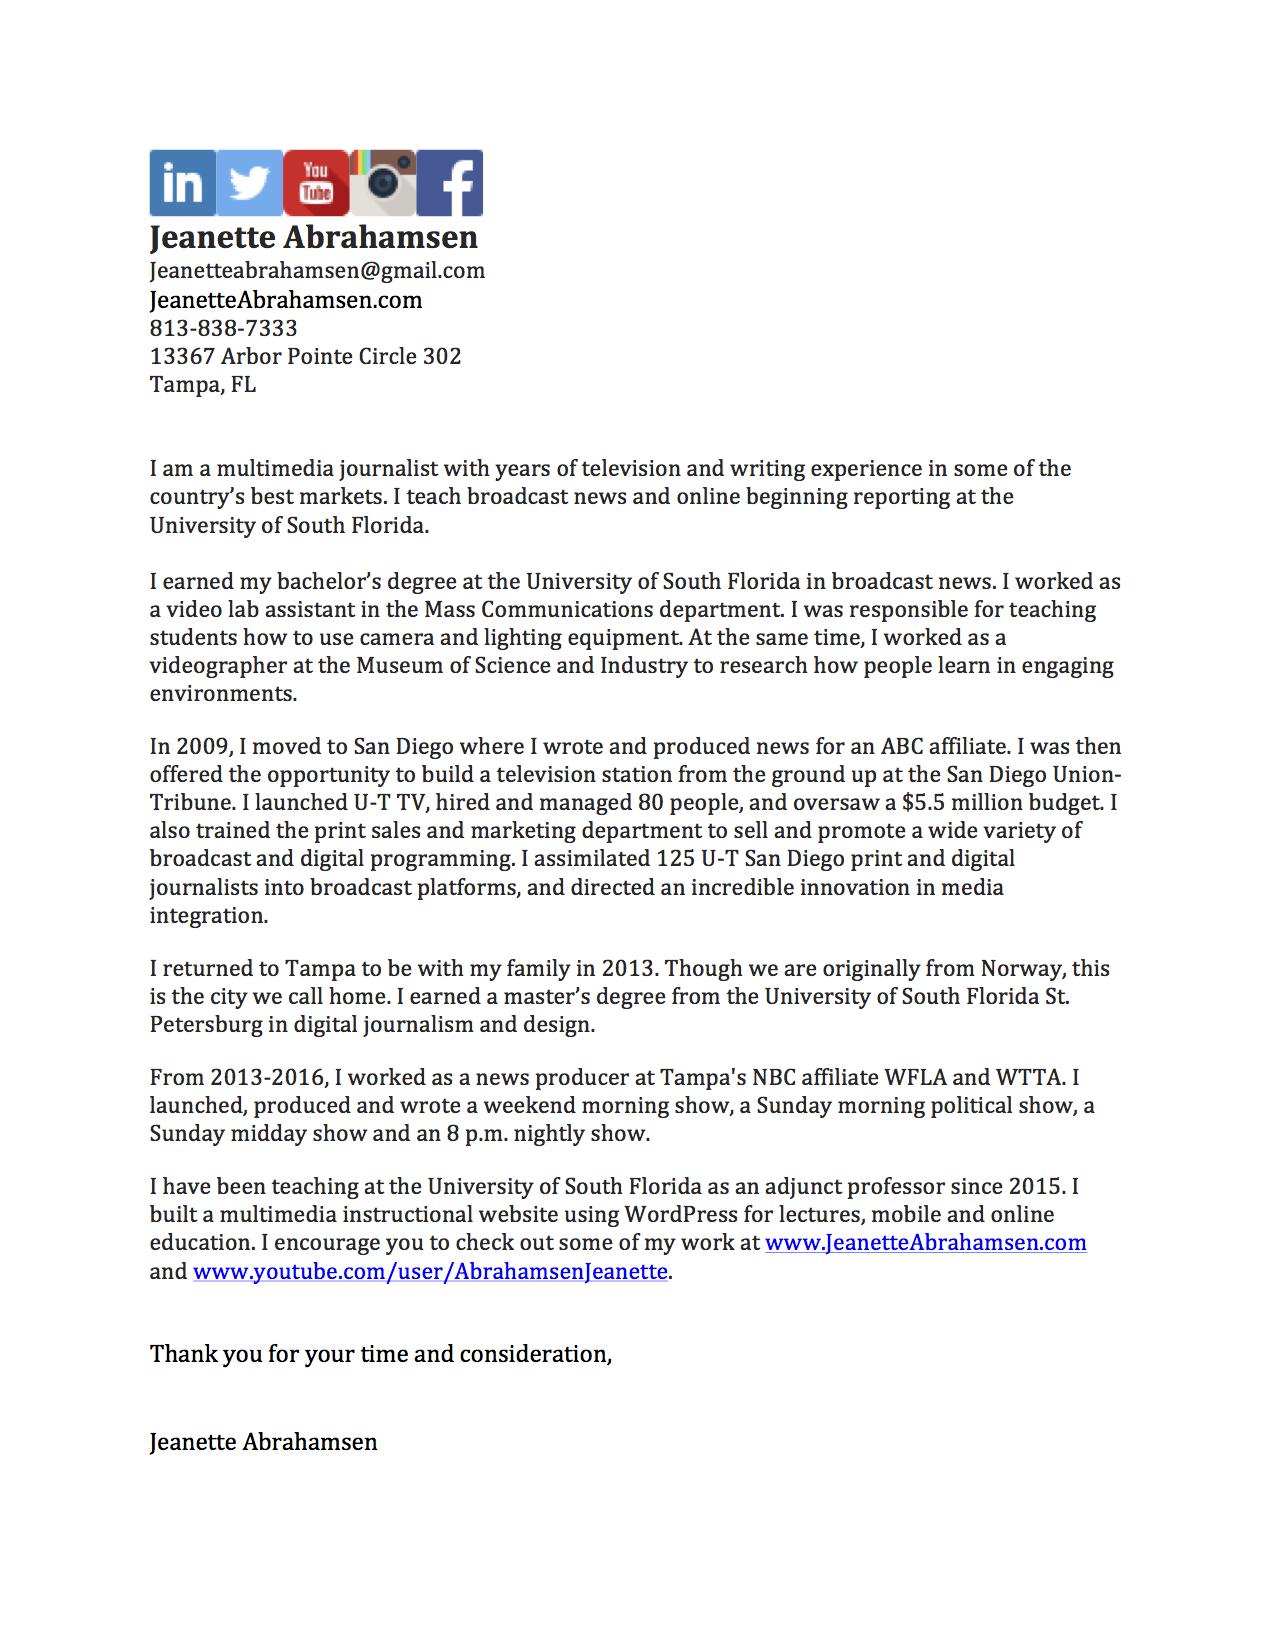 Cover letter journalist - Essay Sample wzcourseworkhjkm ...